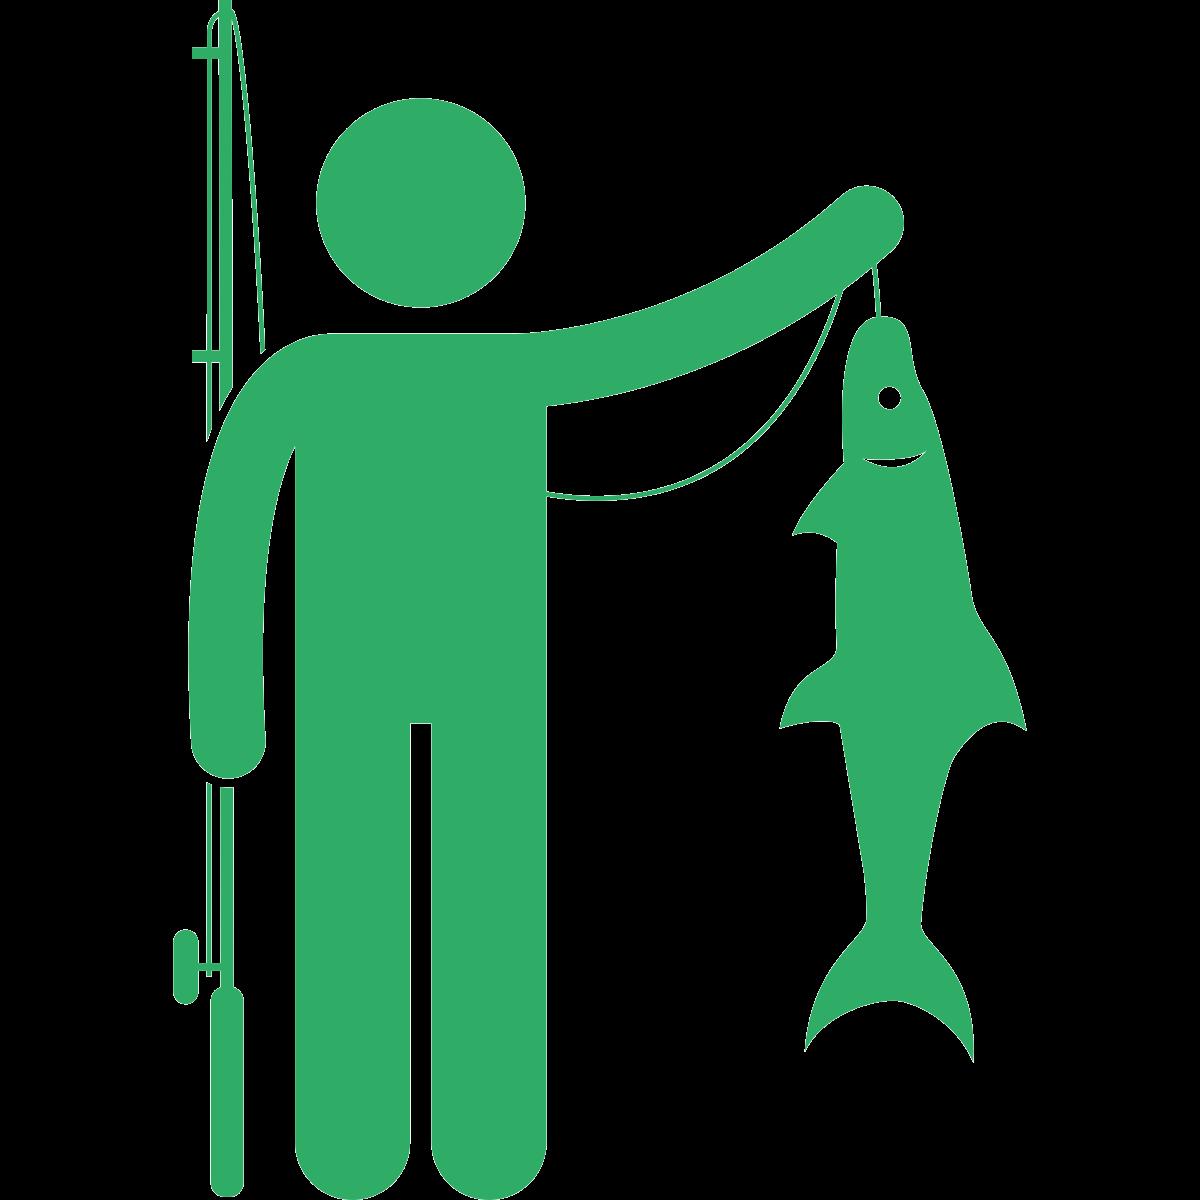 noun_Fishing_1245033_2fac66